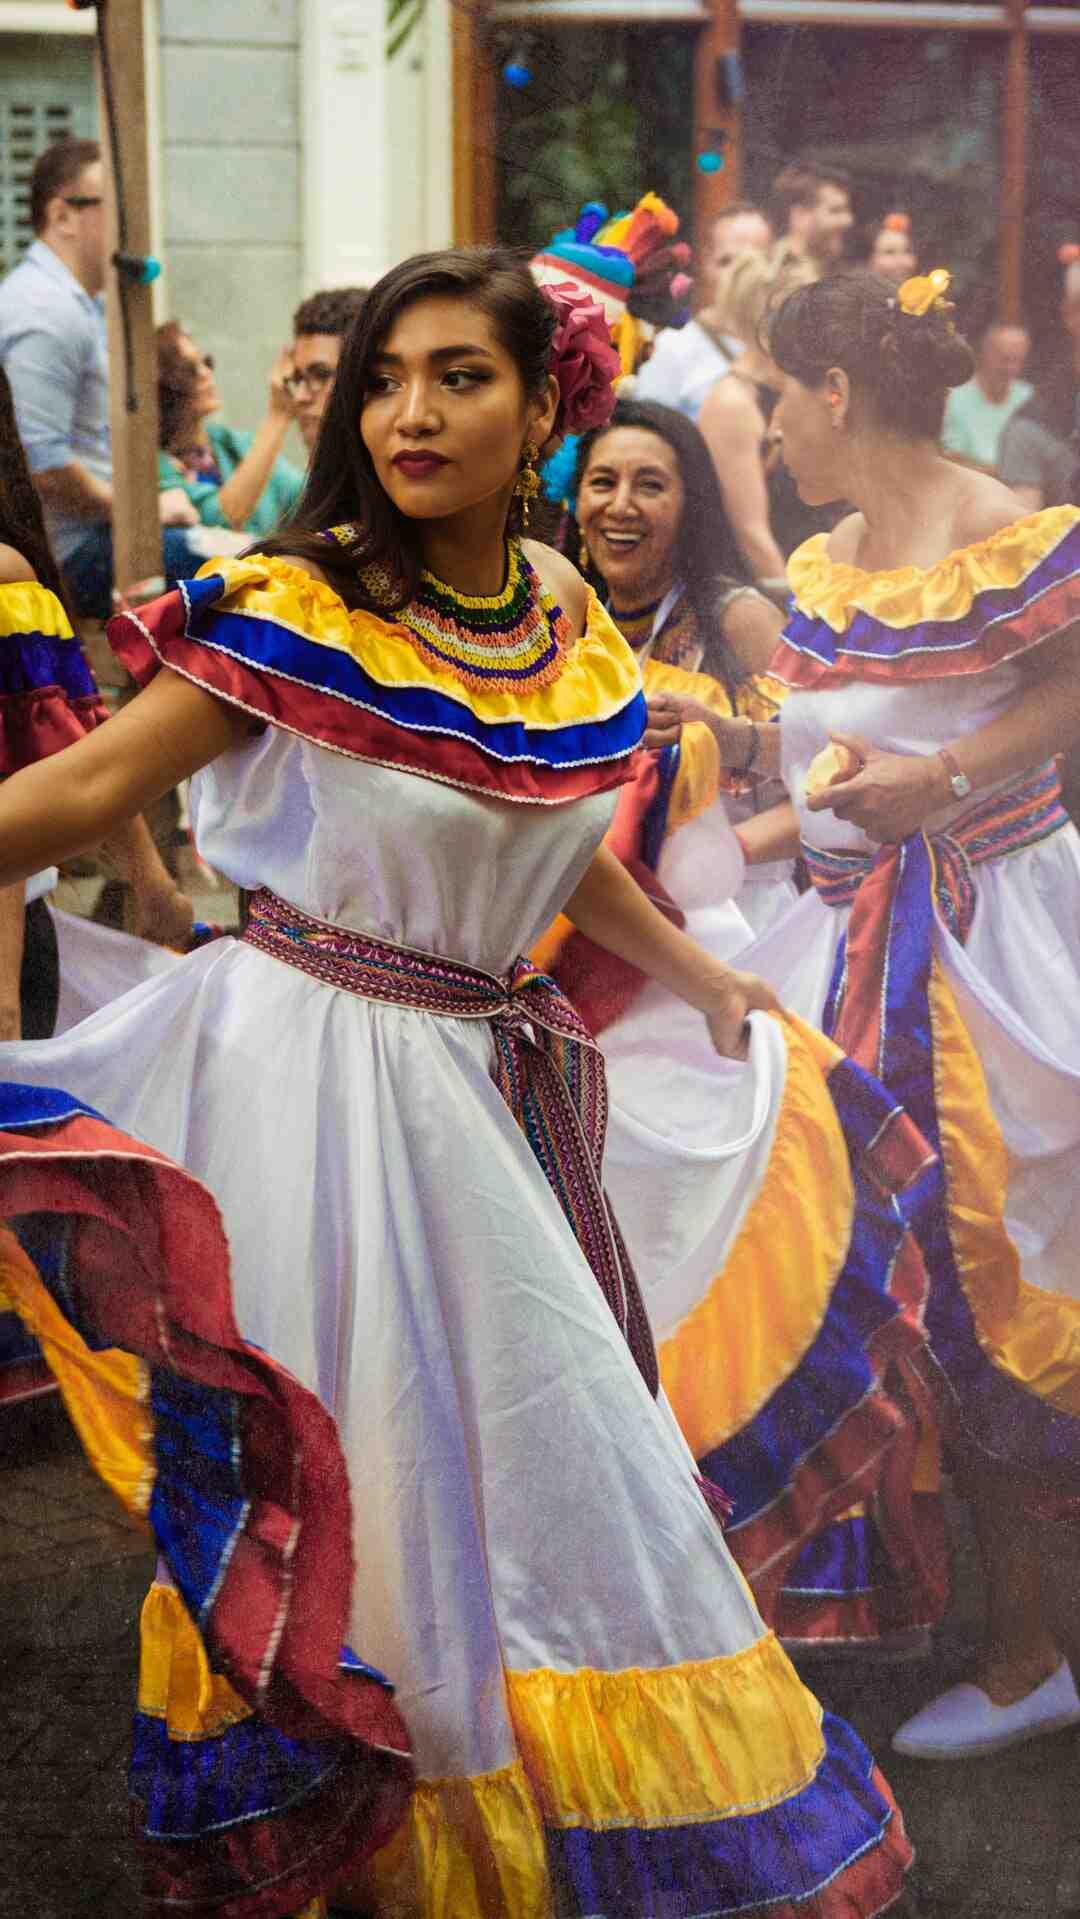 Quel pays danse la rumba ?